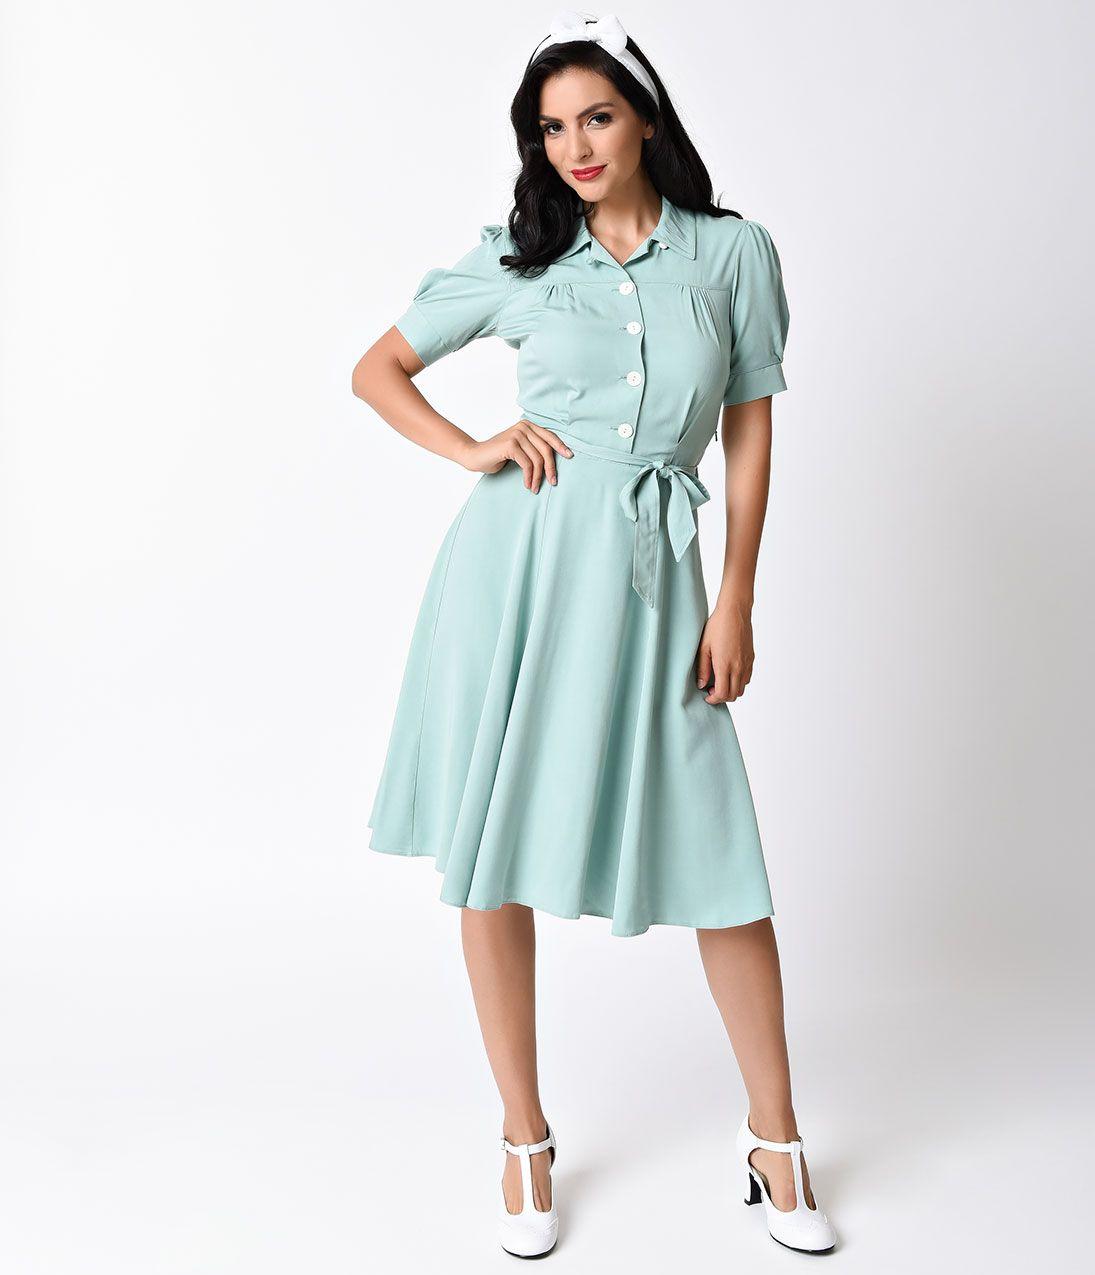 6261bf81232c 1940s Style Mint Shirt Waister Short Sleeve Swing Dress  180.00 AT…